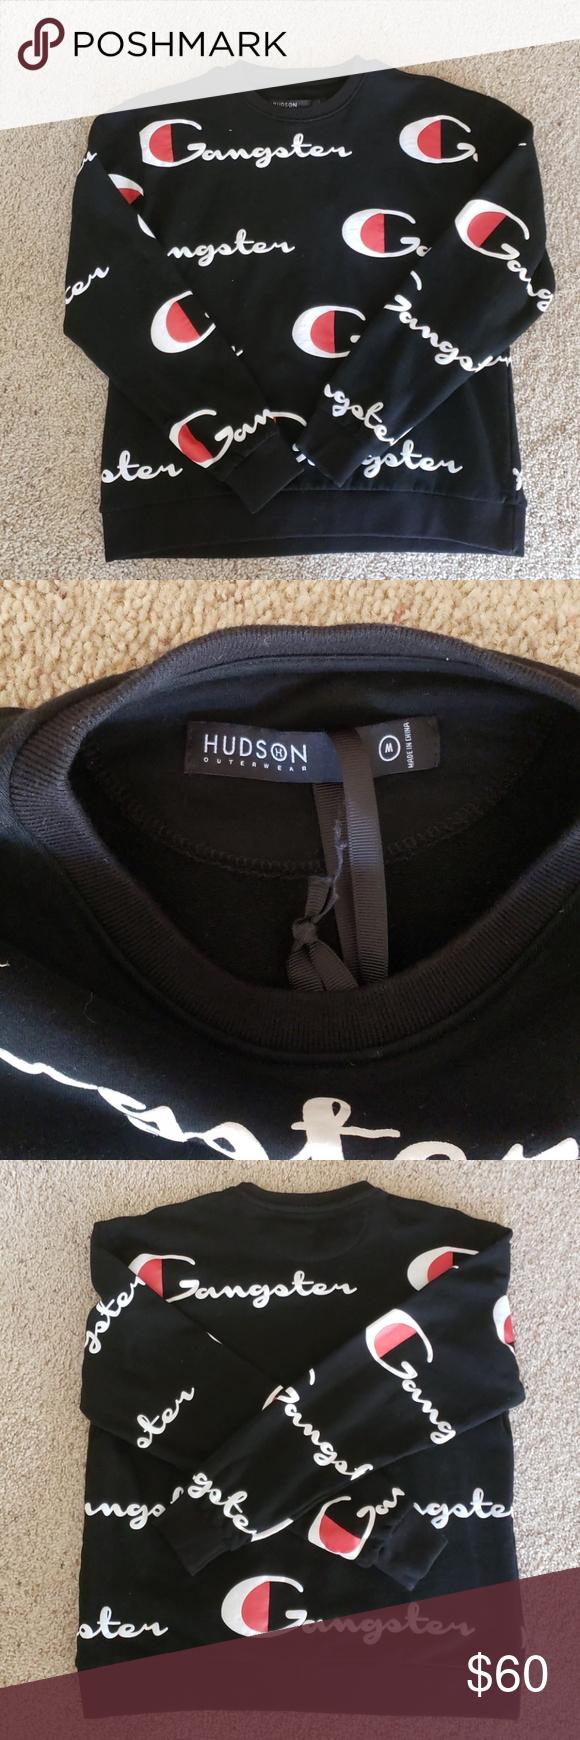 Hudson Outerwear Gangster Sweatshirt Size M Sweatshirts Hudson Jeans Outerwear [ 1740 x 580 Pixel ]